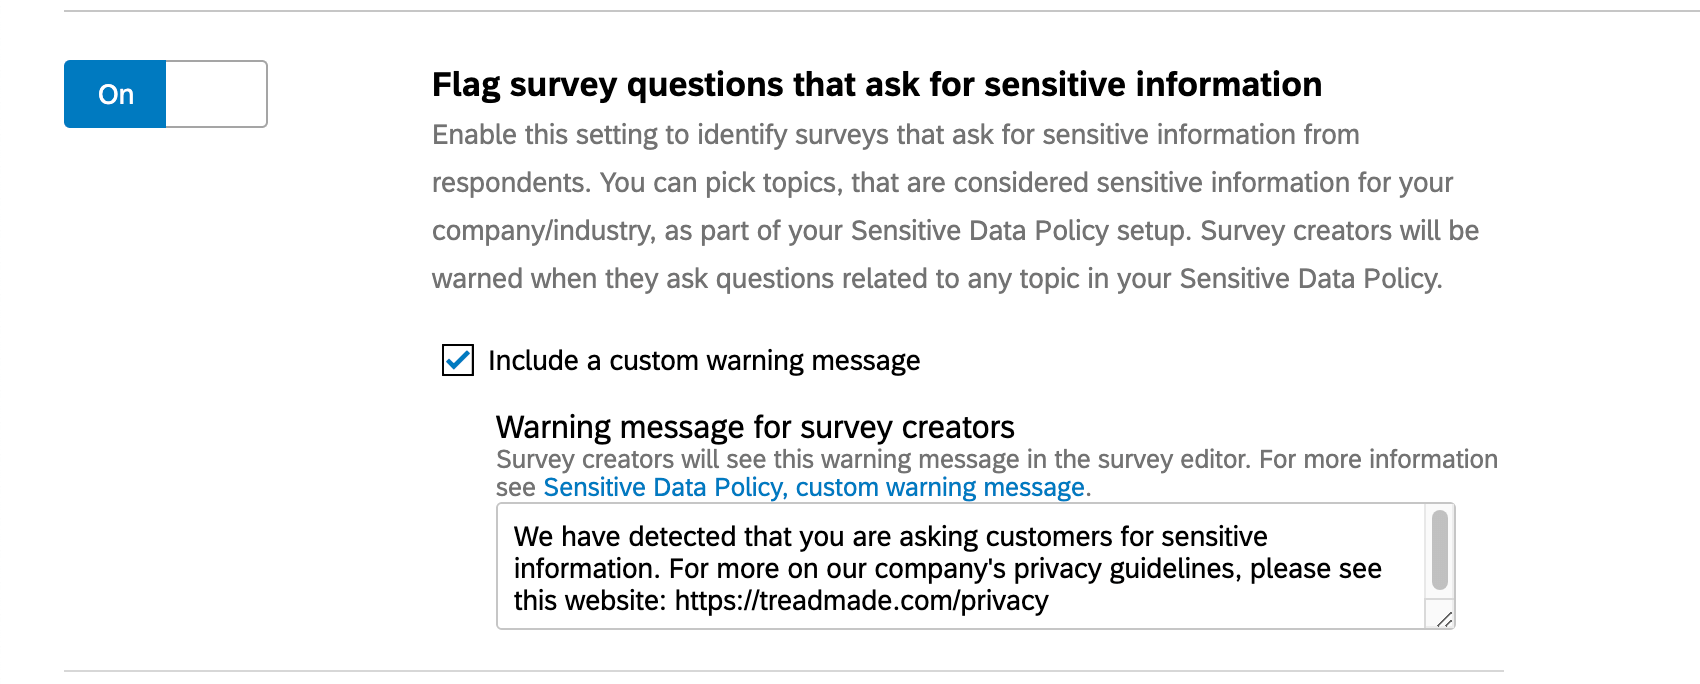 Flag survey questions that ask for sensitive information